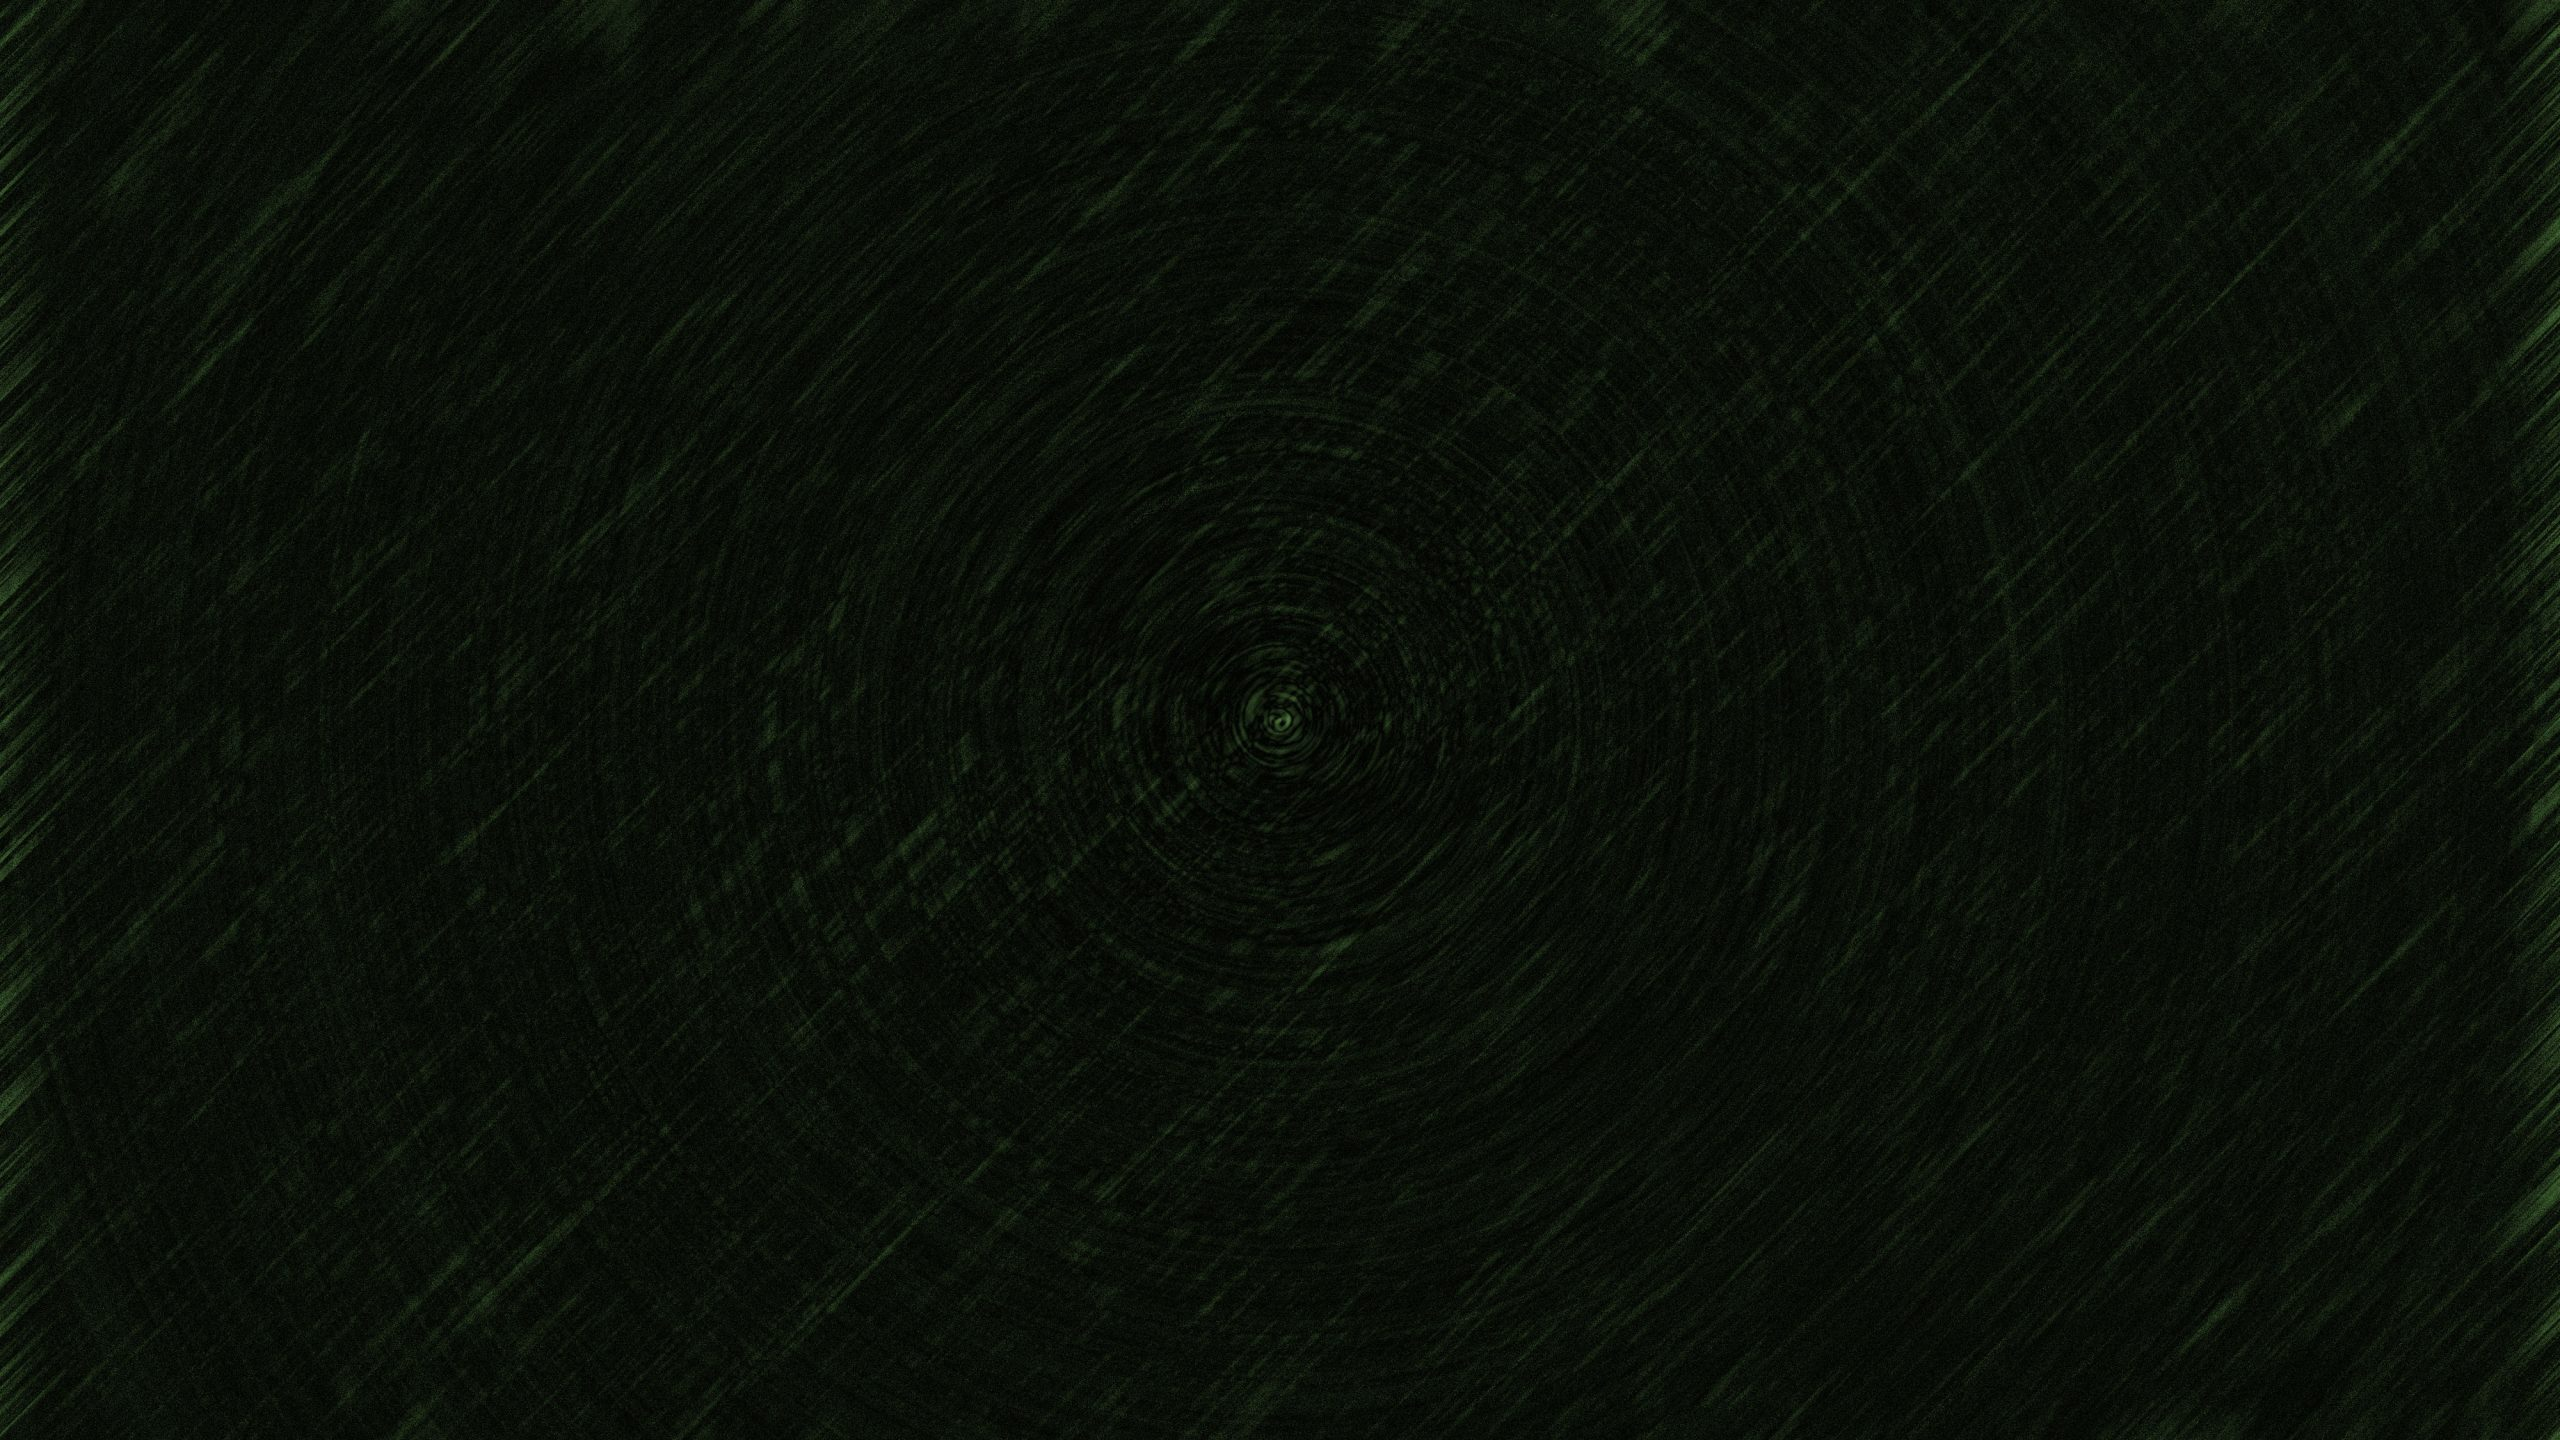 Dark green pattern wallpaper